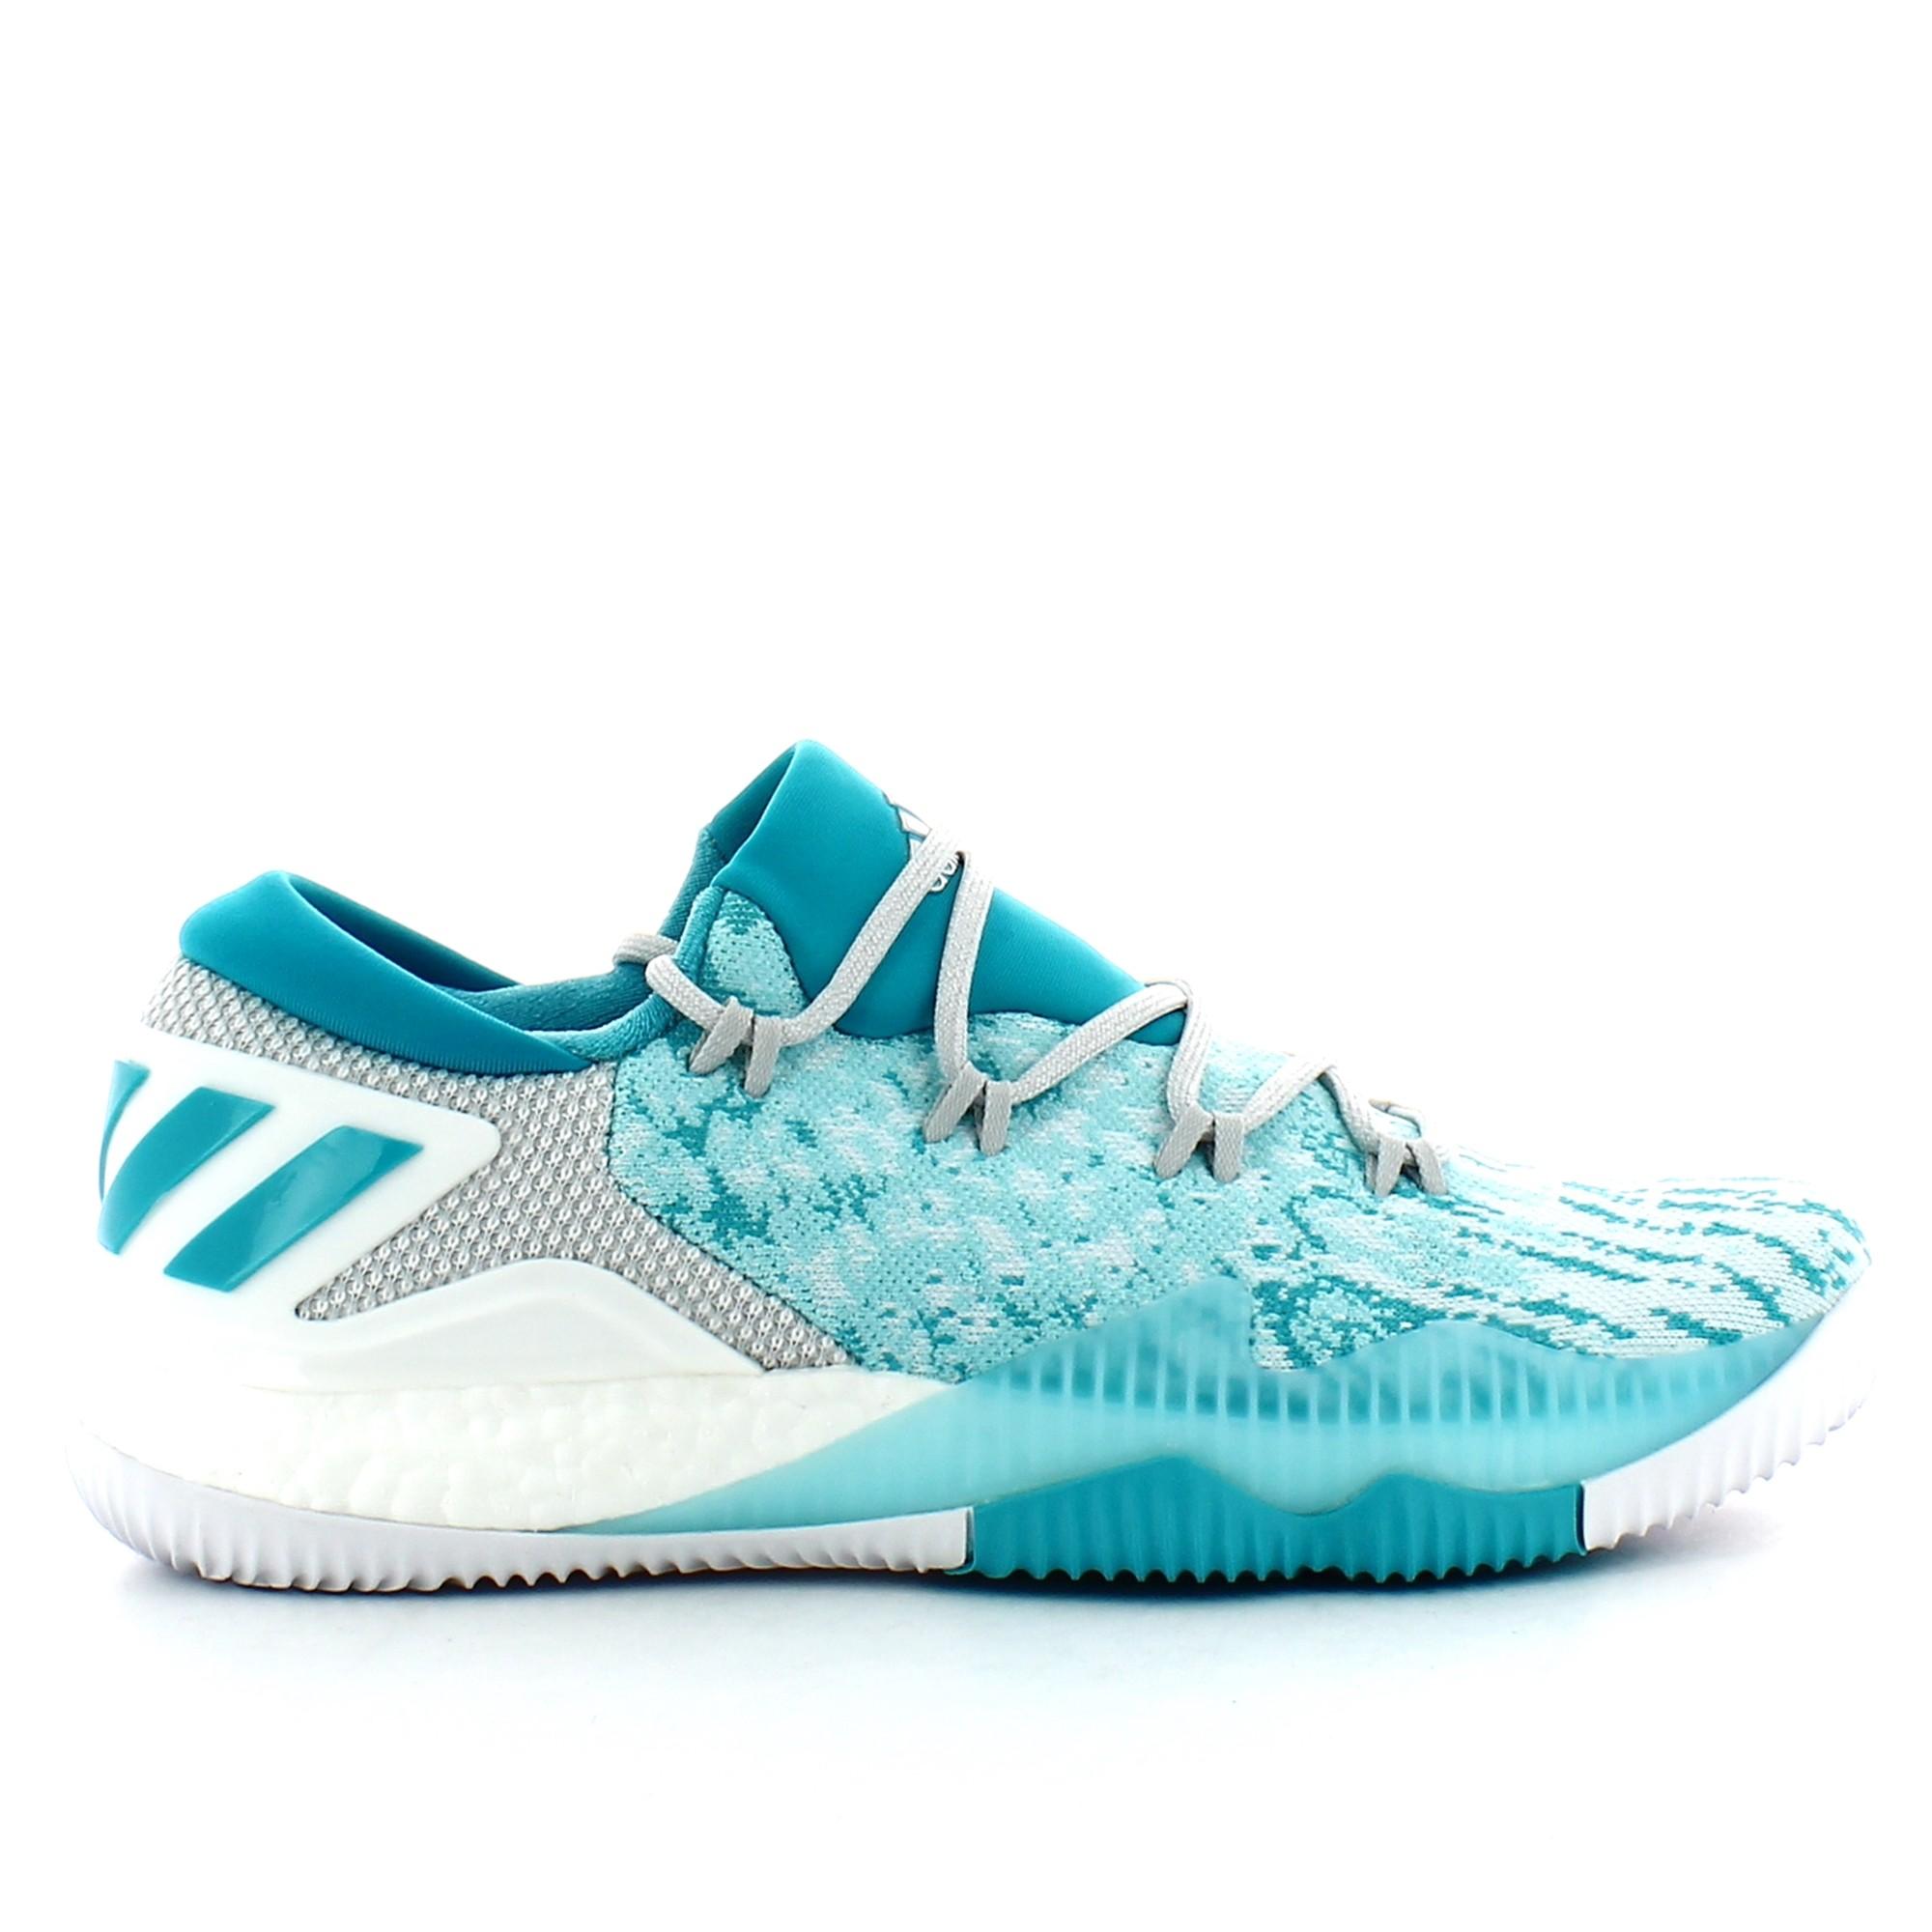 Zapatillas adidas Crazylight Boost Low 2016 aguamarina